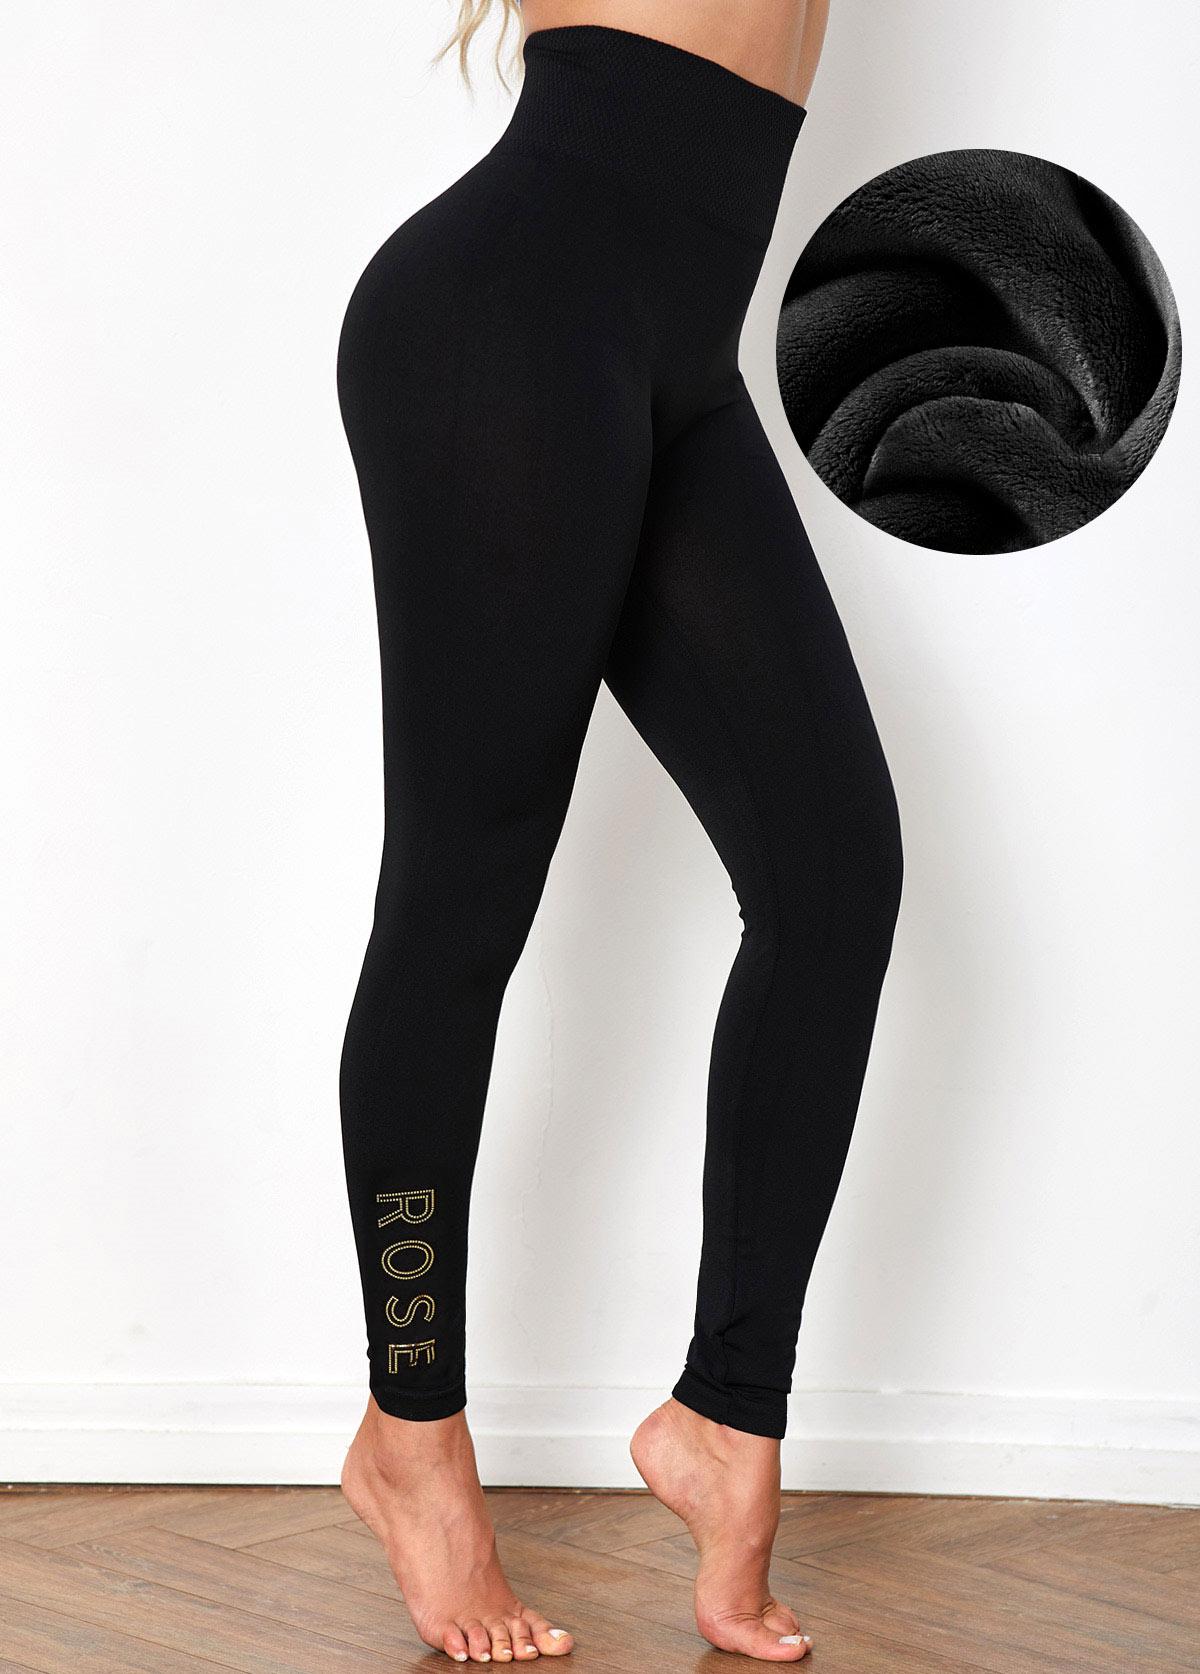 Sequin Letter Super Elastic High Waist Legging Pants